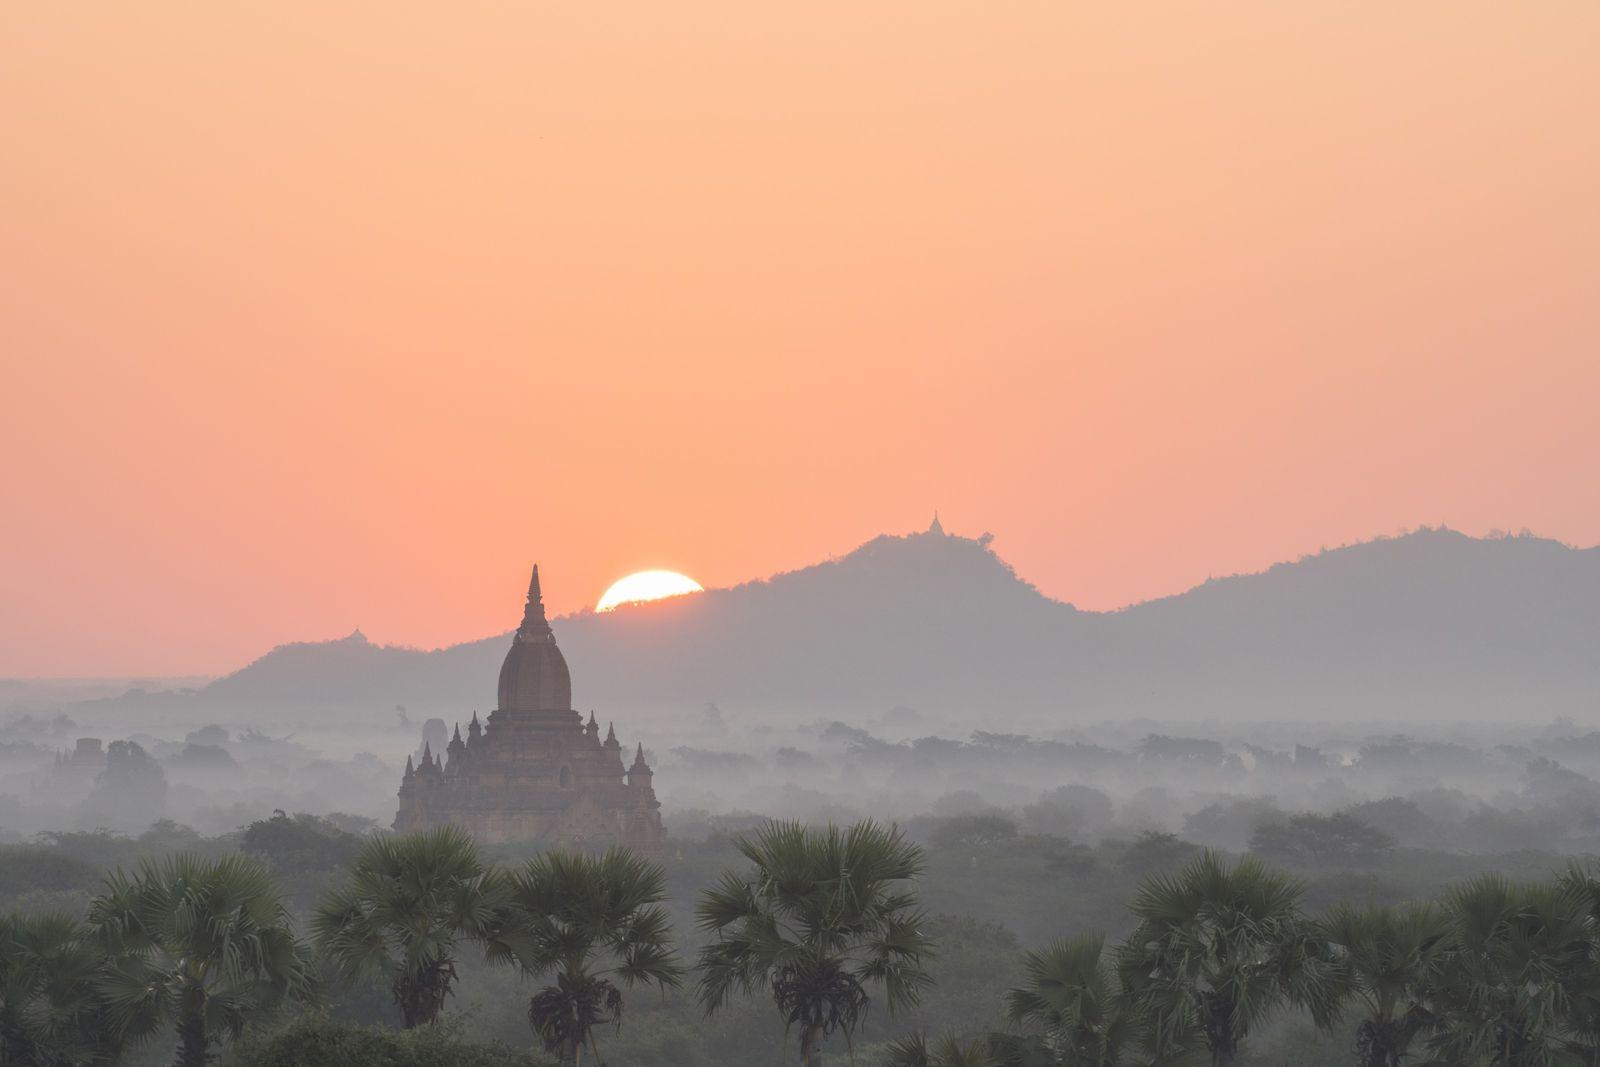 Sonnenaufgang in Myanmar